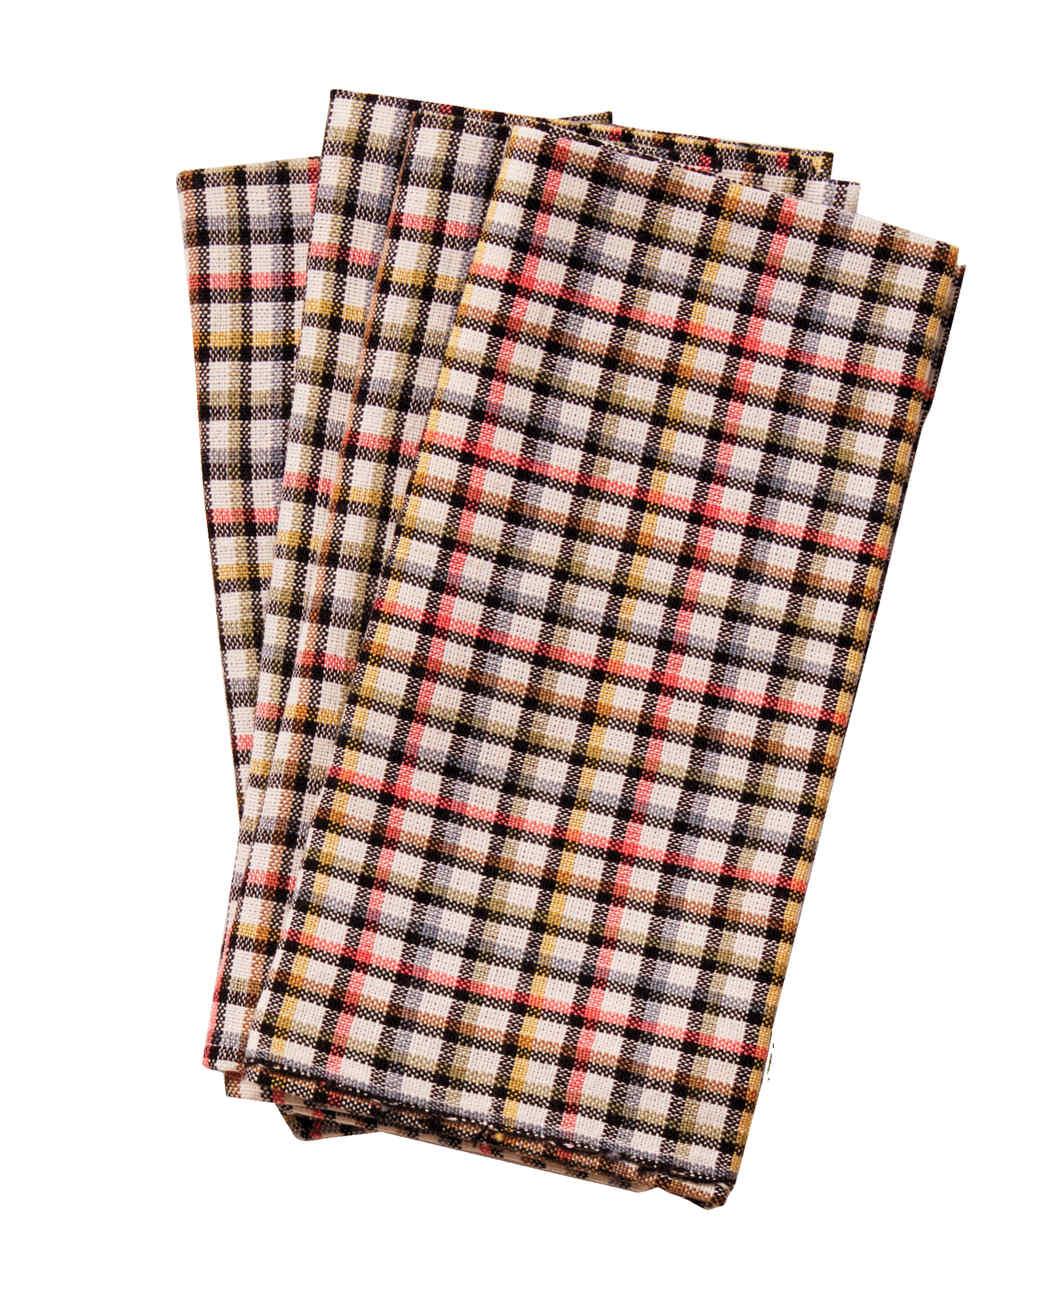 heather-taylor-napkins-049-d112494.jpg